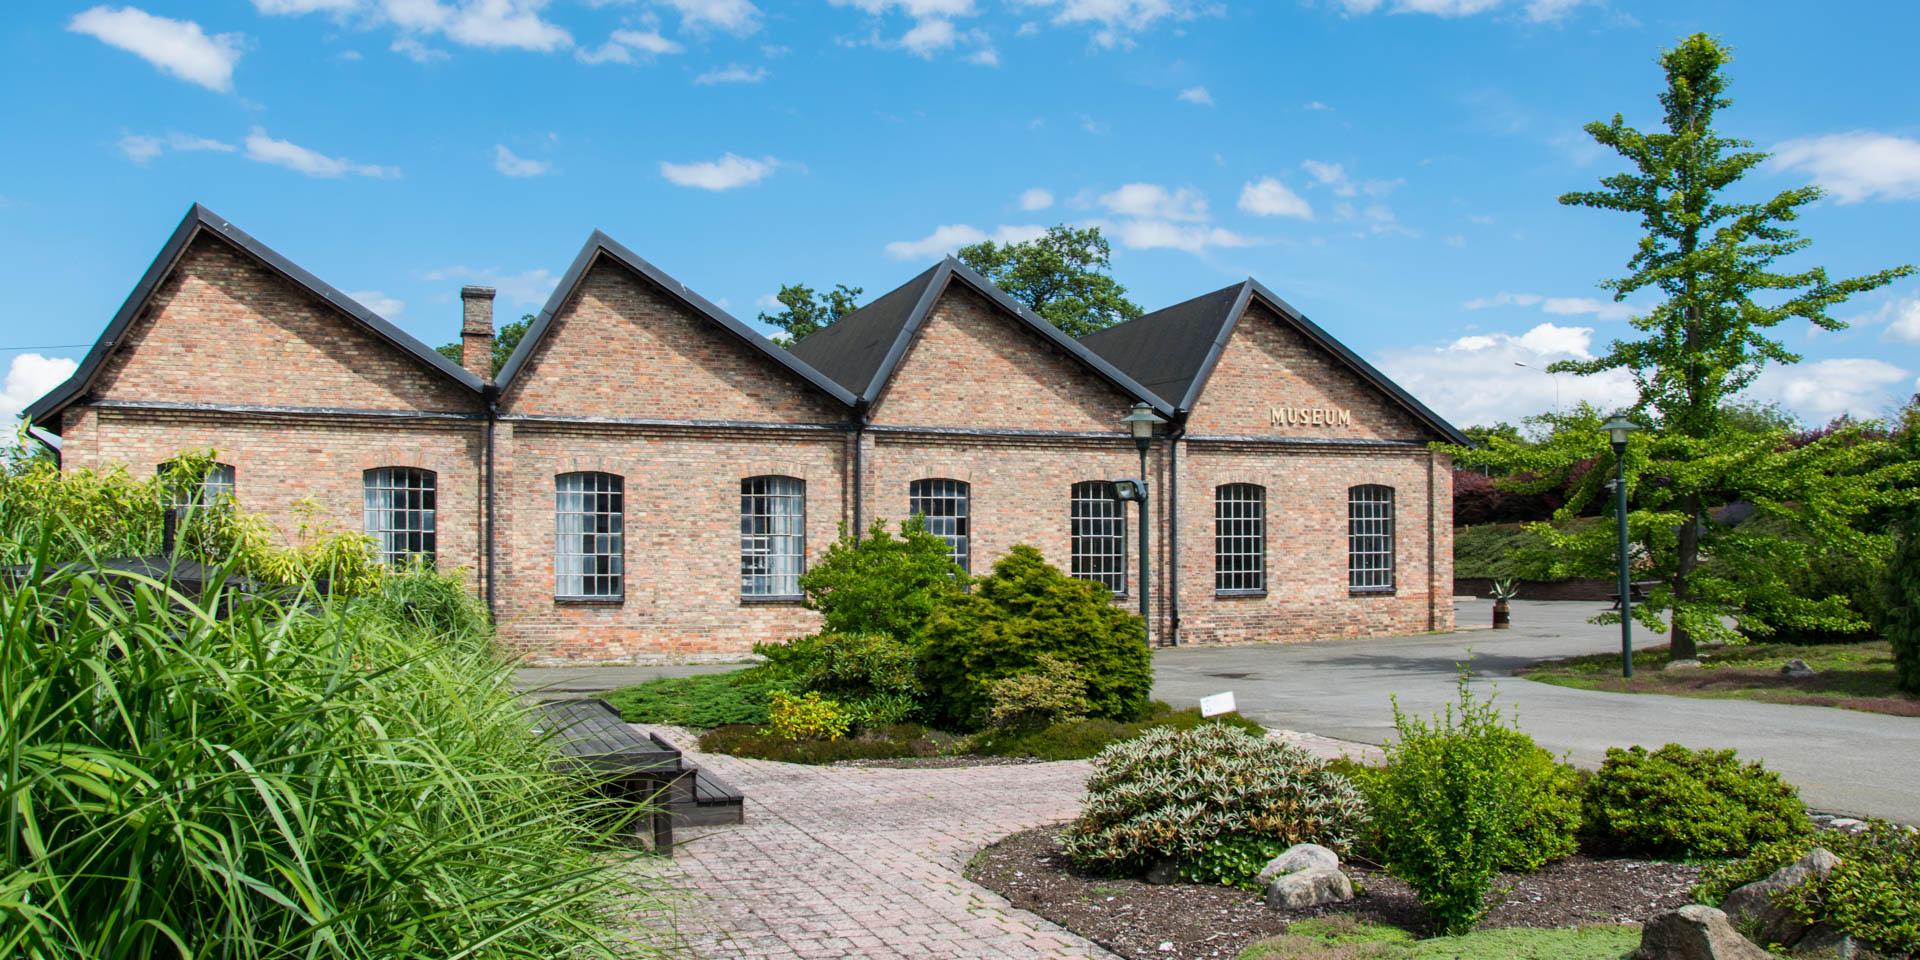 Iföverkens Industrimuseum 2016